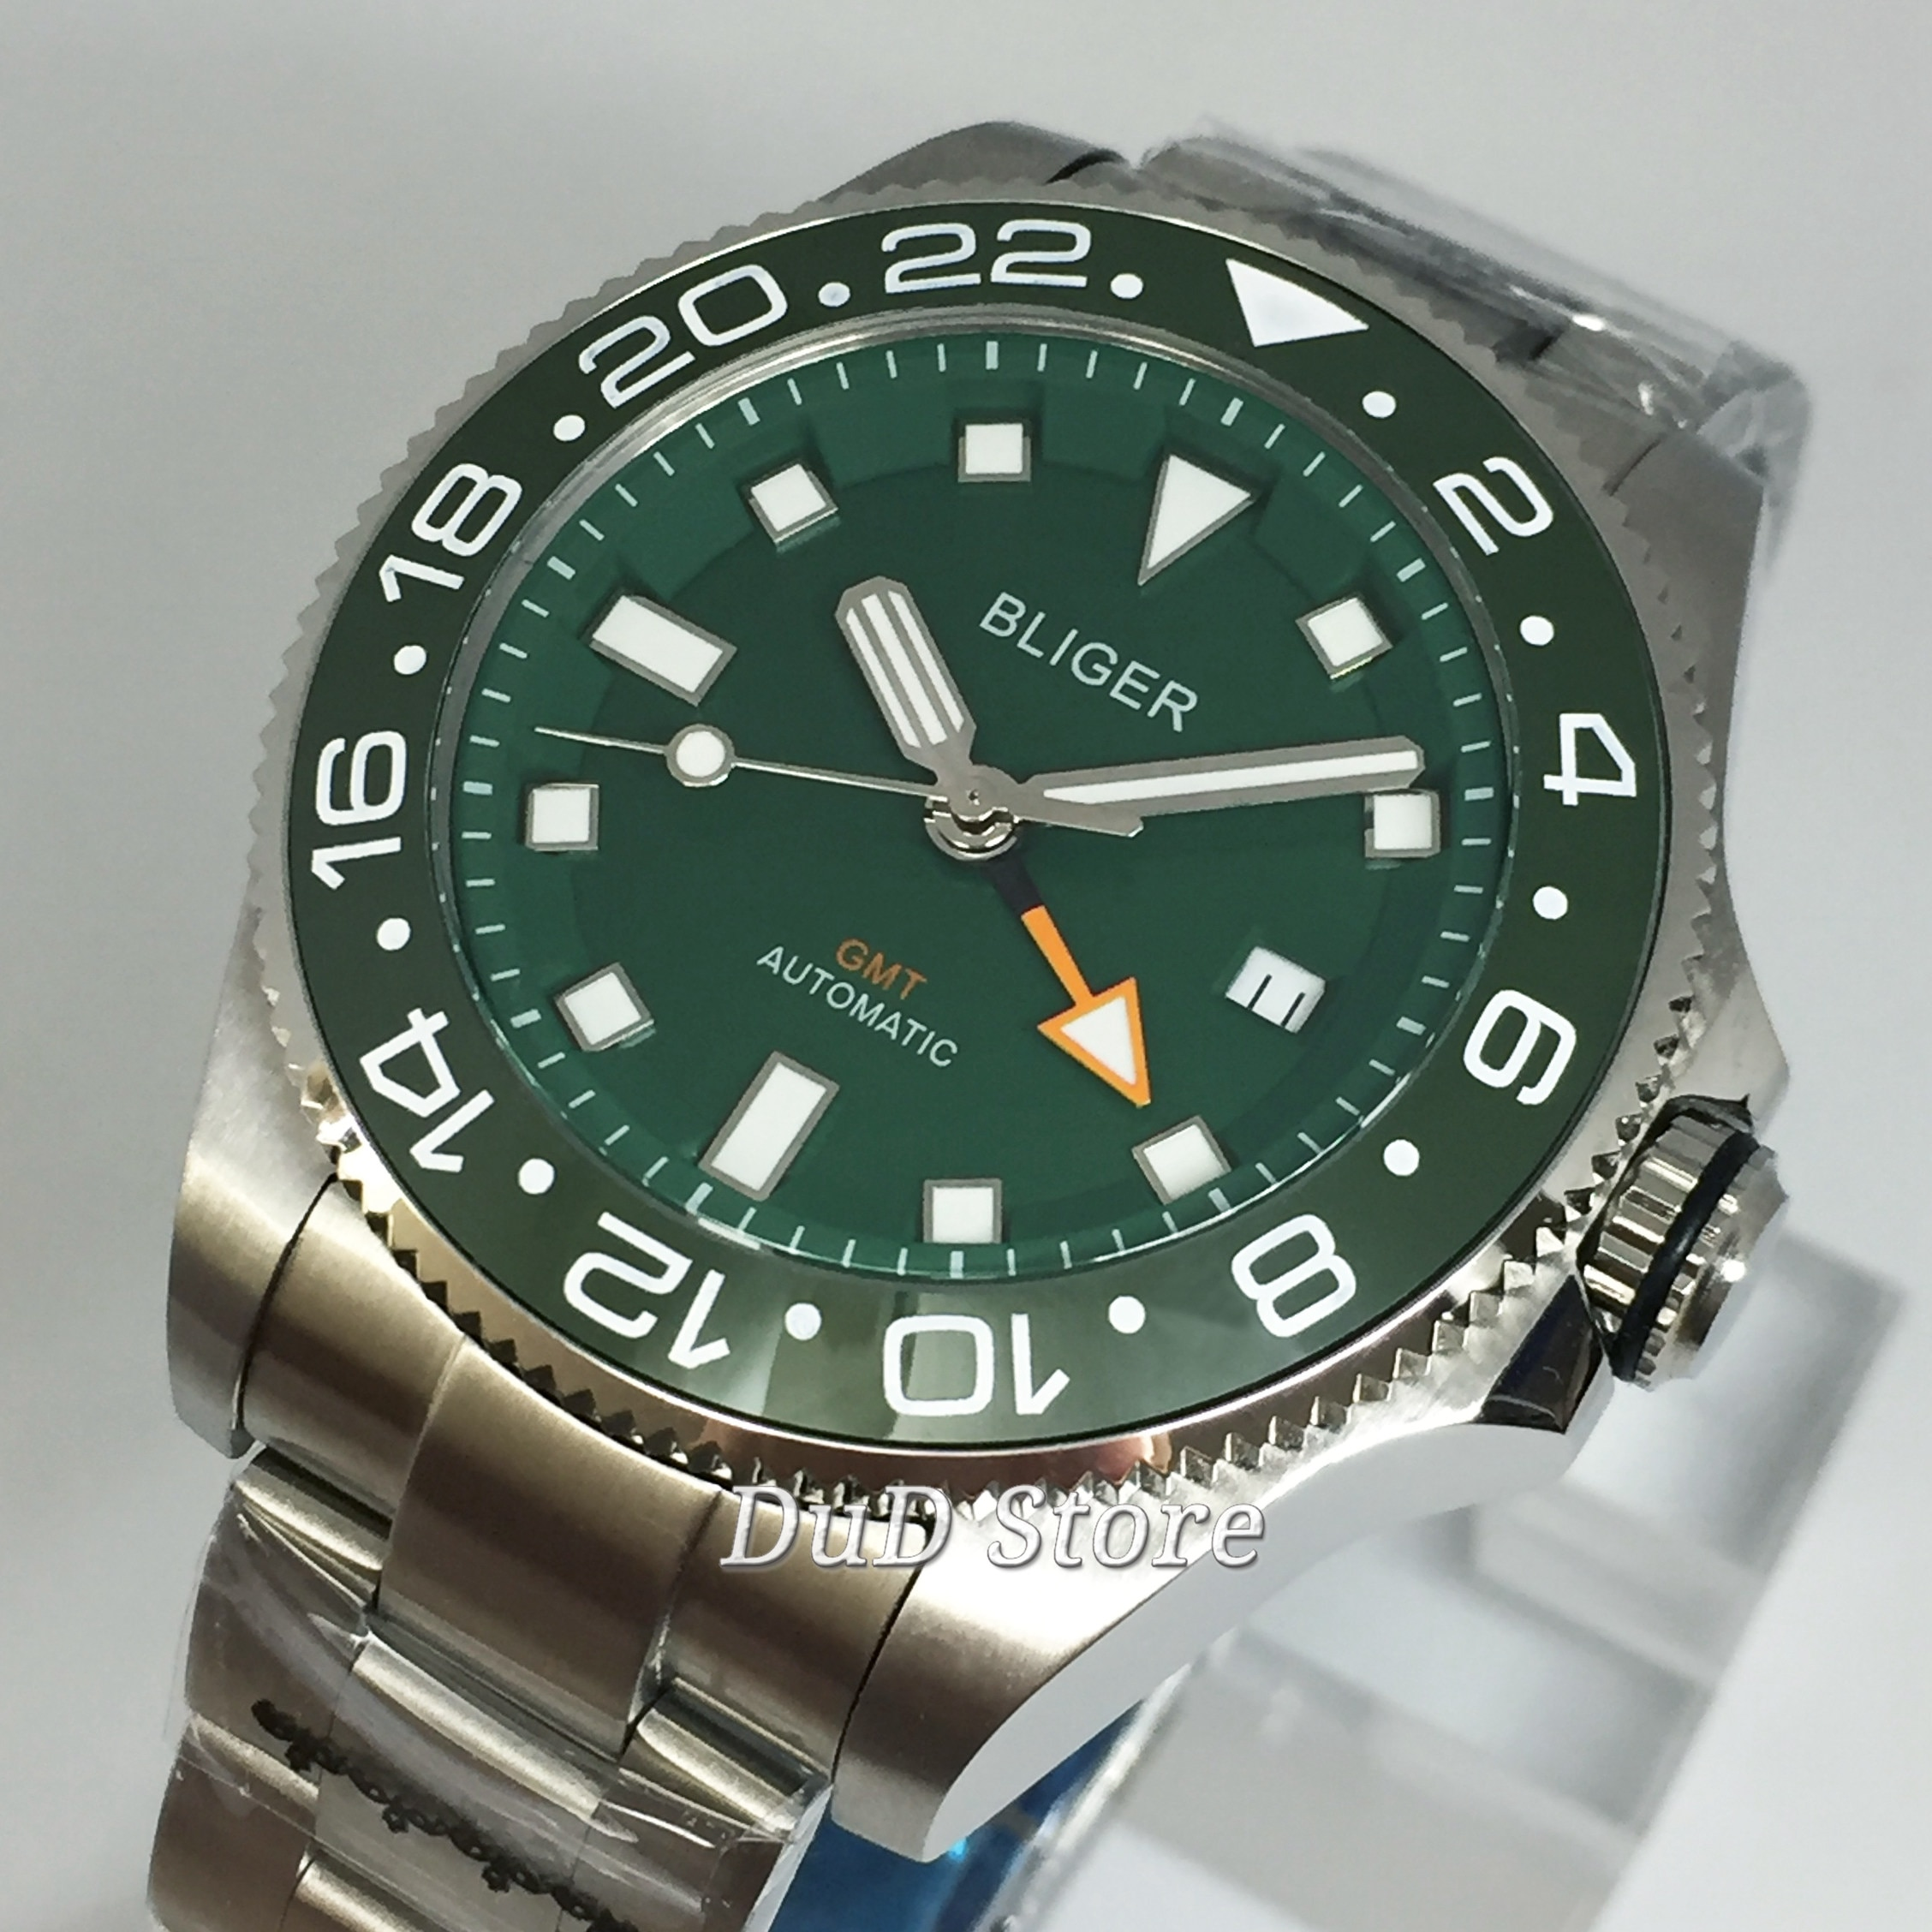 Bliger 43mm carcasa plateada superior de lujo mecánico reloj con cristal de zafiro dial verde bisel de cerámica luminoso reloj automático GMT para hombres